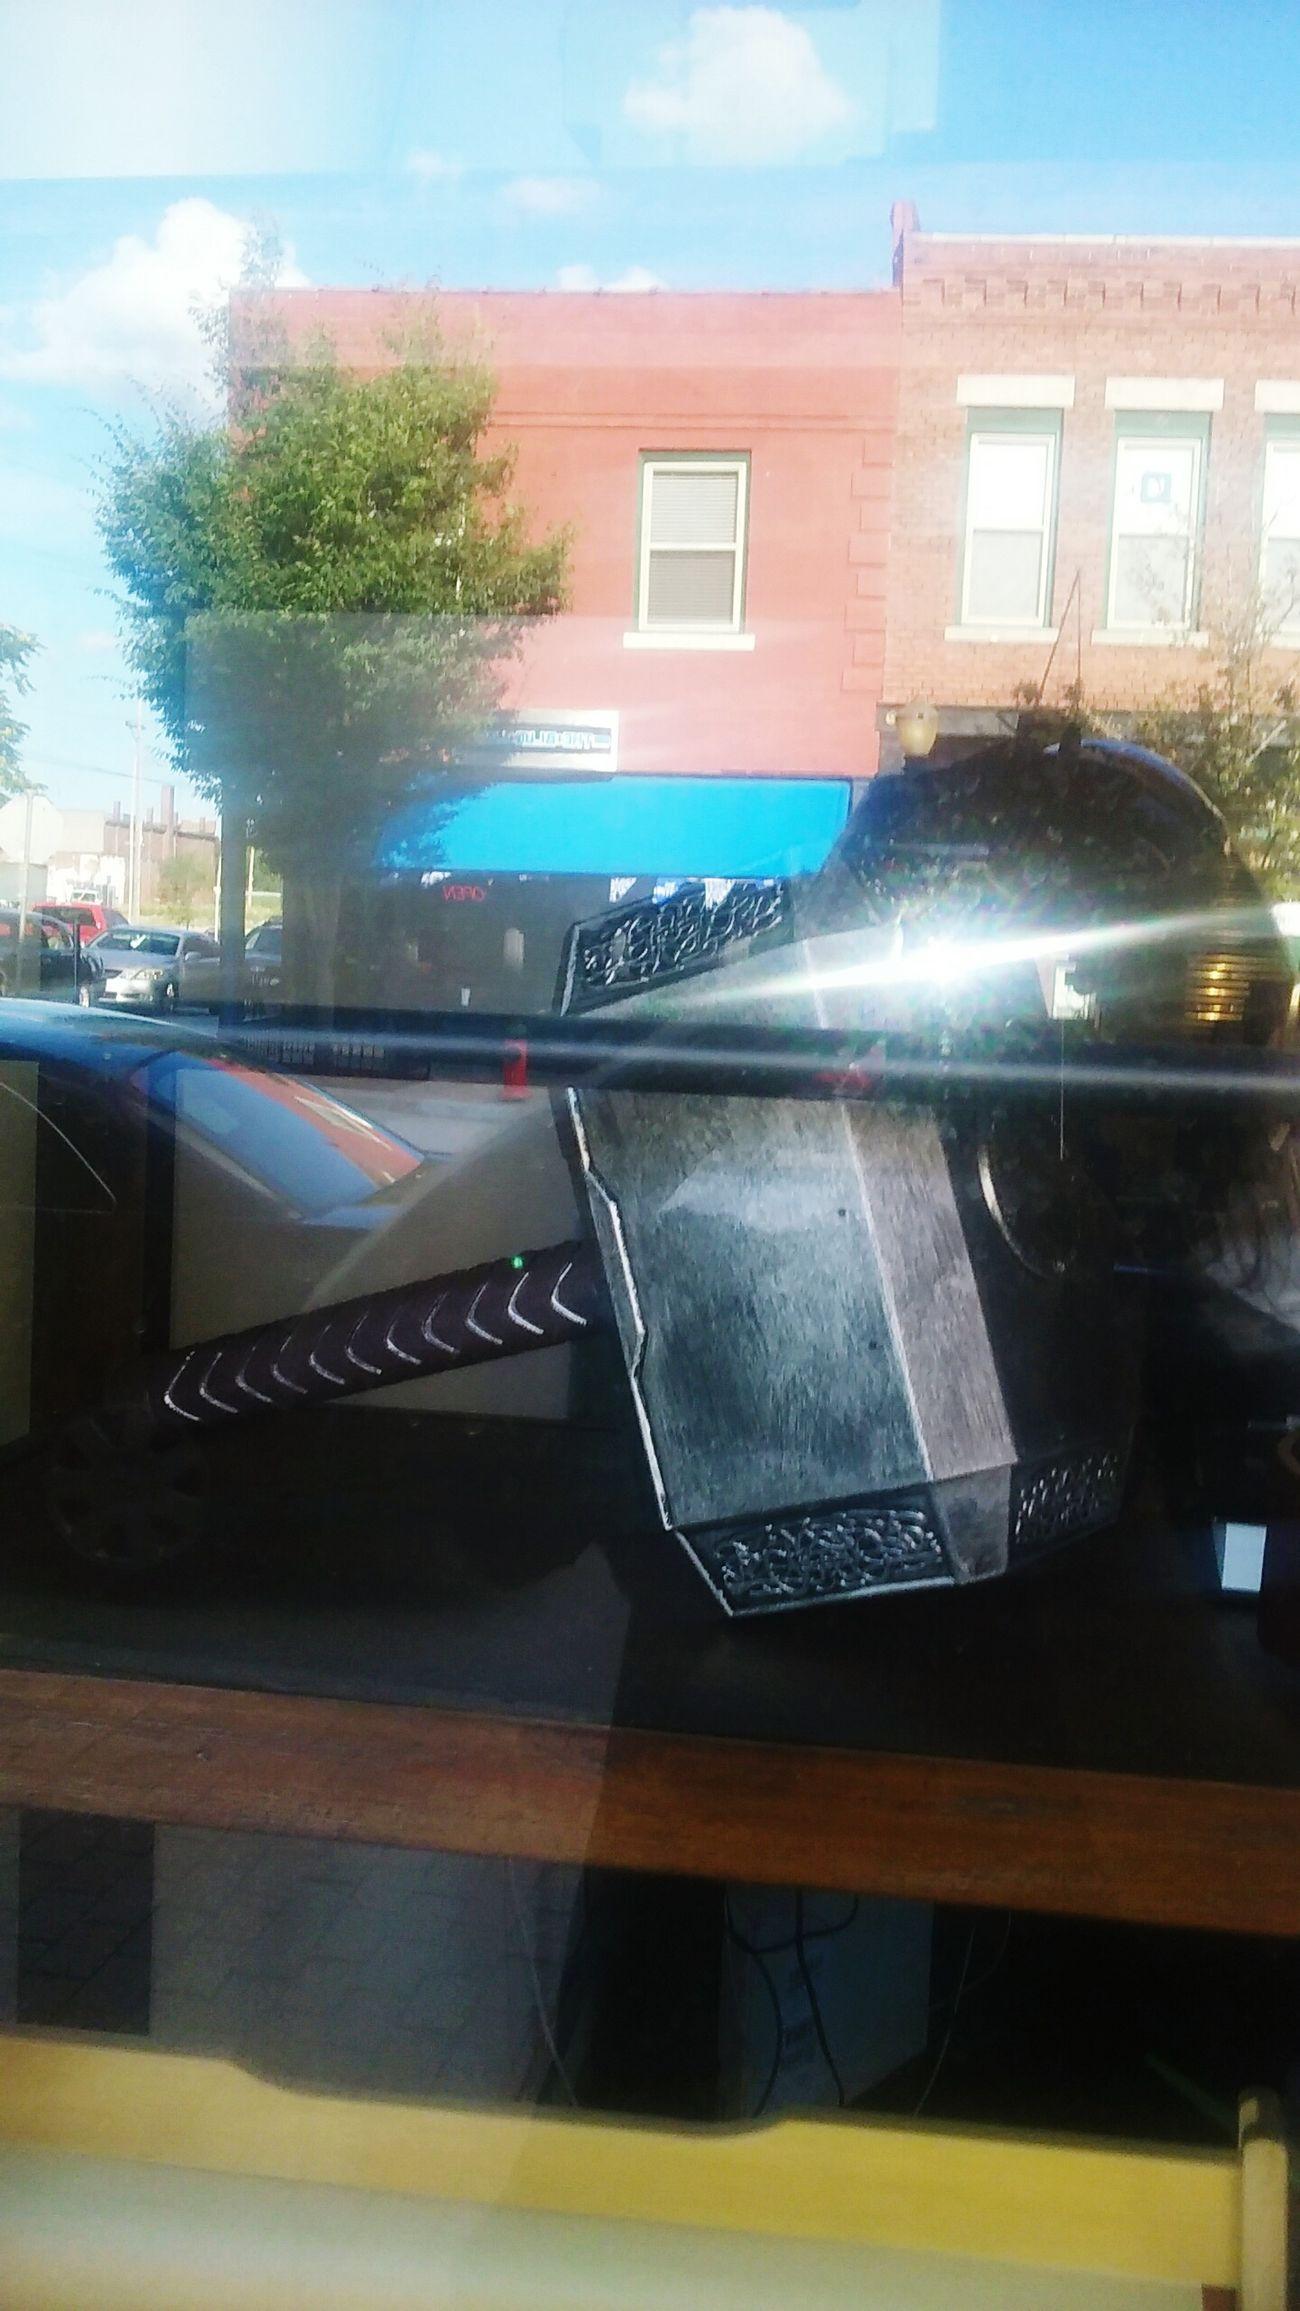 Thor's hammer?